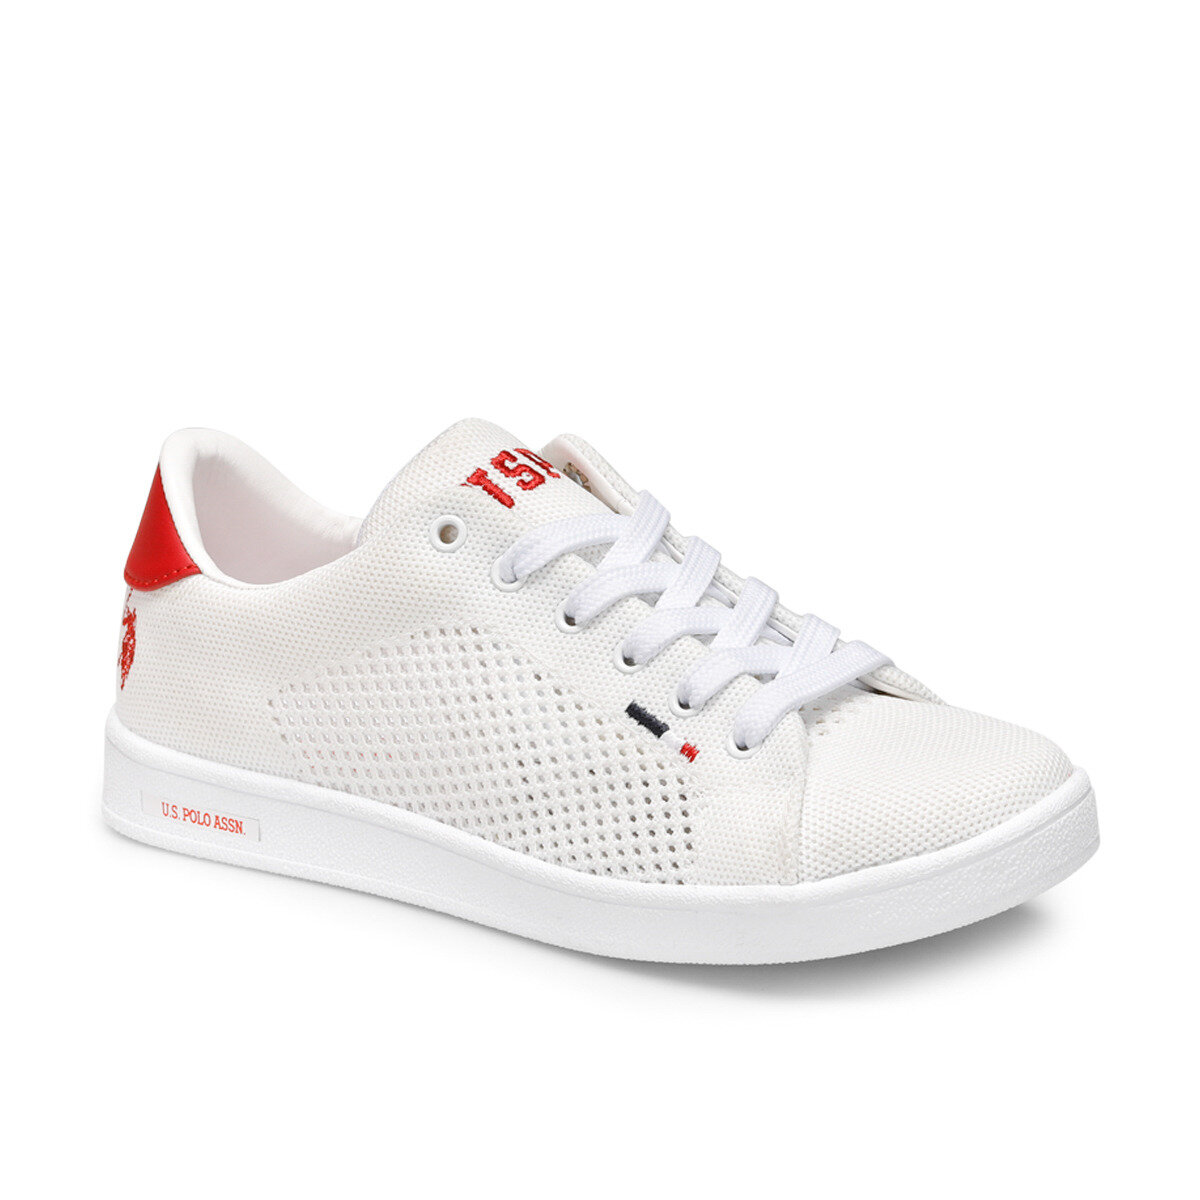 FLO FRANCO KNITTING White Women 'S Sneaker Shoes U.S. POLO ASSN.